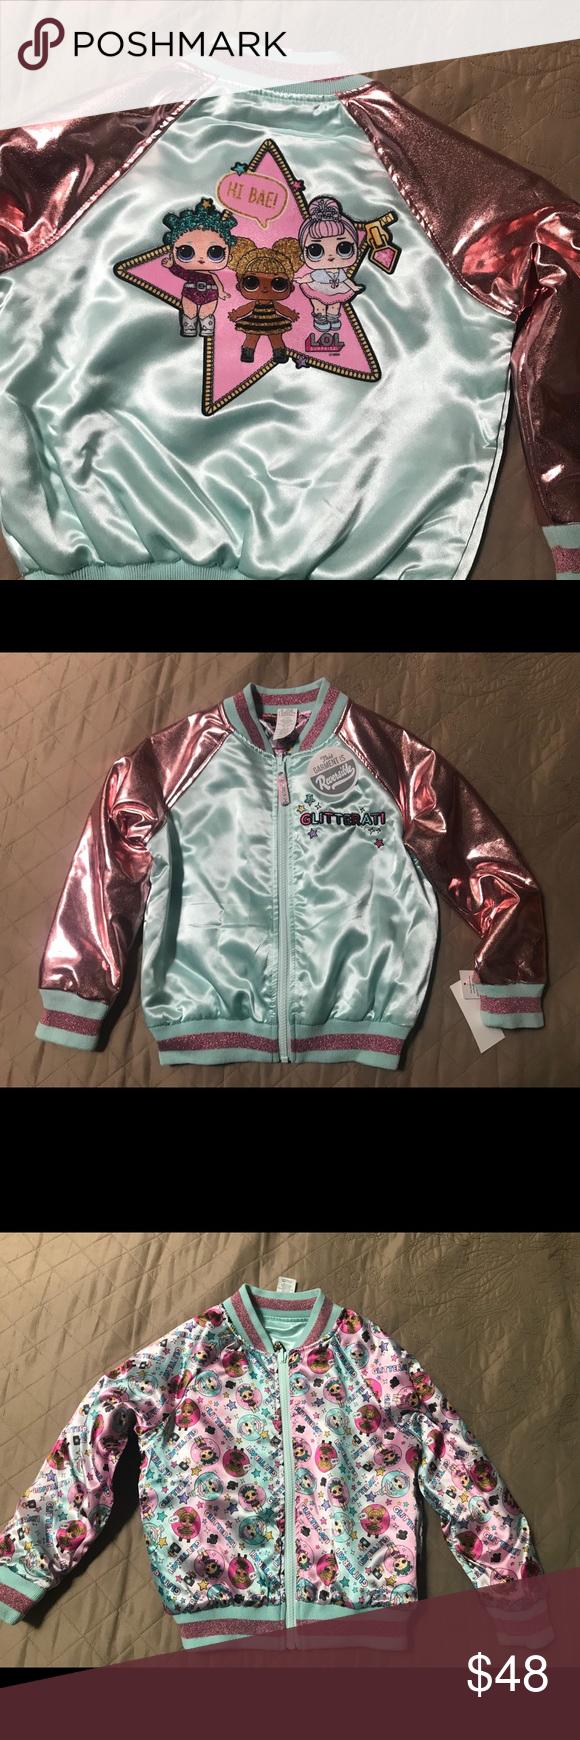 Lol Girls Reversible Jacket Size Xs Lol Surprise Girls Reversible Jacket Brand New Mga Jackets Coats Utility Jacket Reversible Jackets Jackets Jacket Brands [ 1740 x 580 Pixel ]